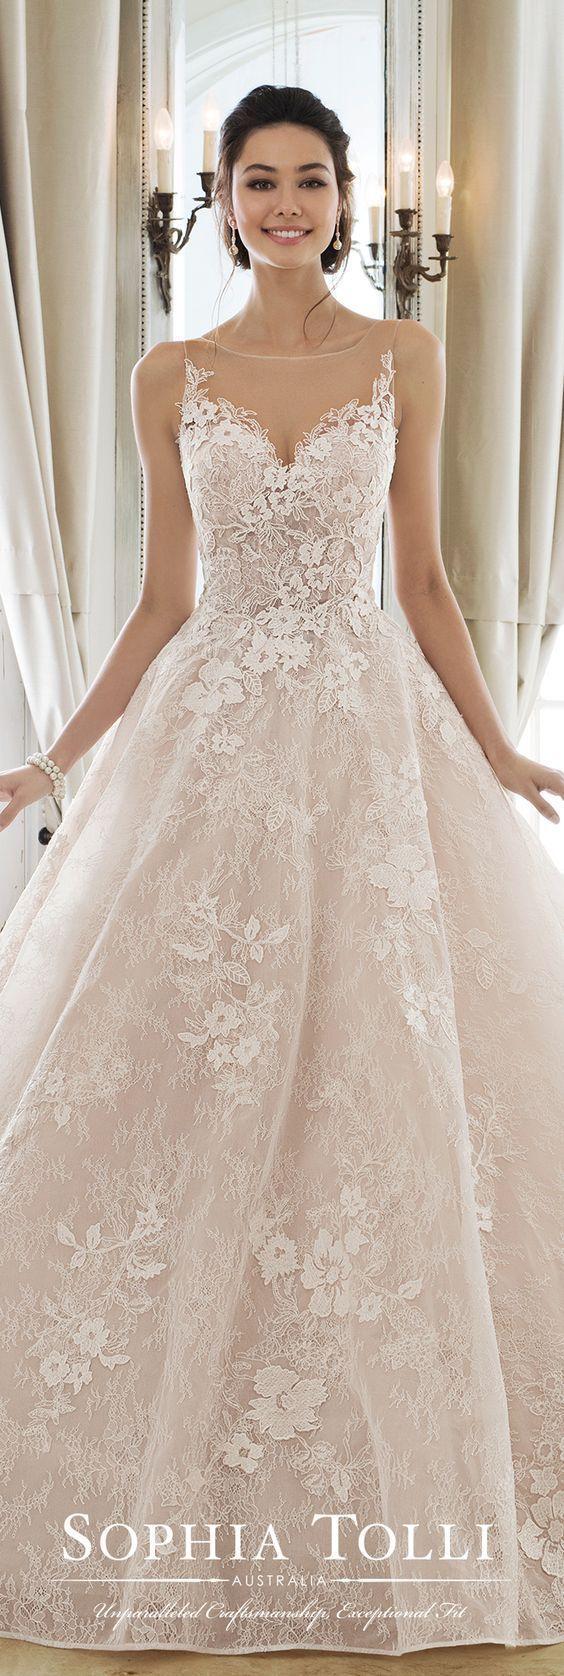 Organza Lace Sweetheart Ballkleid Brautkleid - Y10 Aphrodite